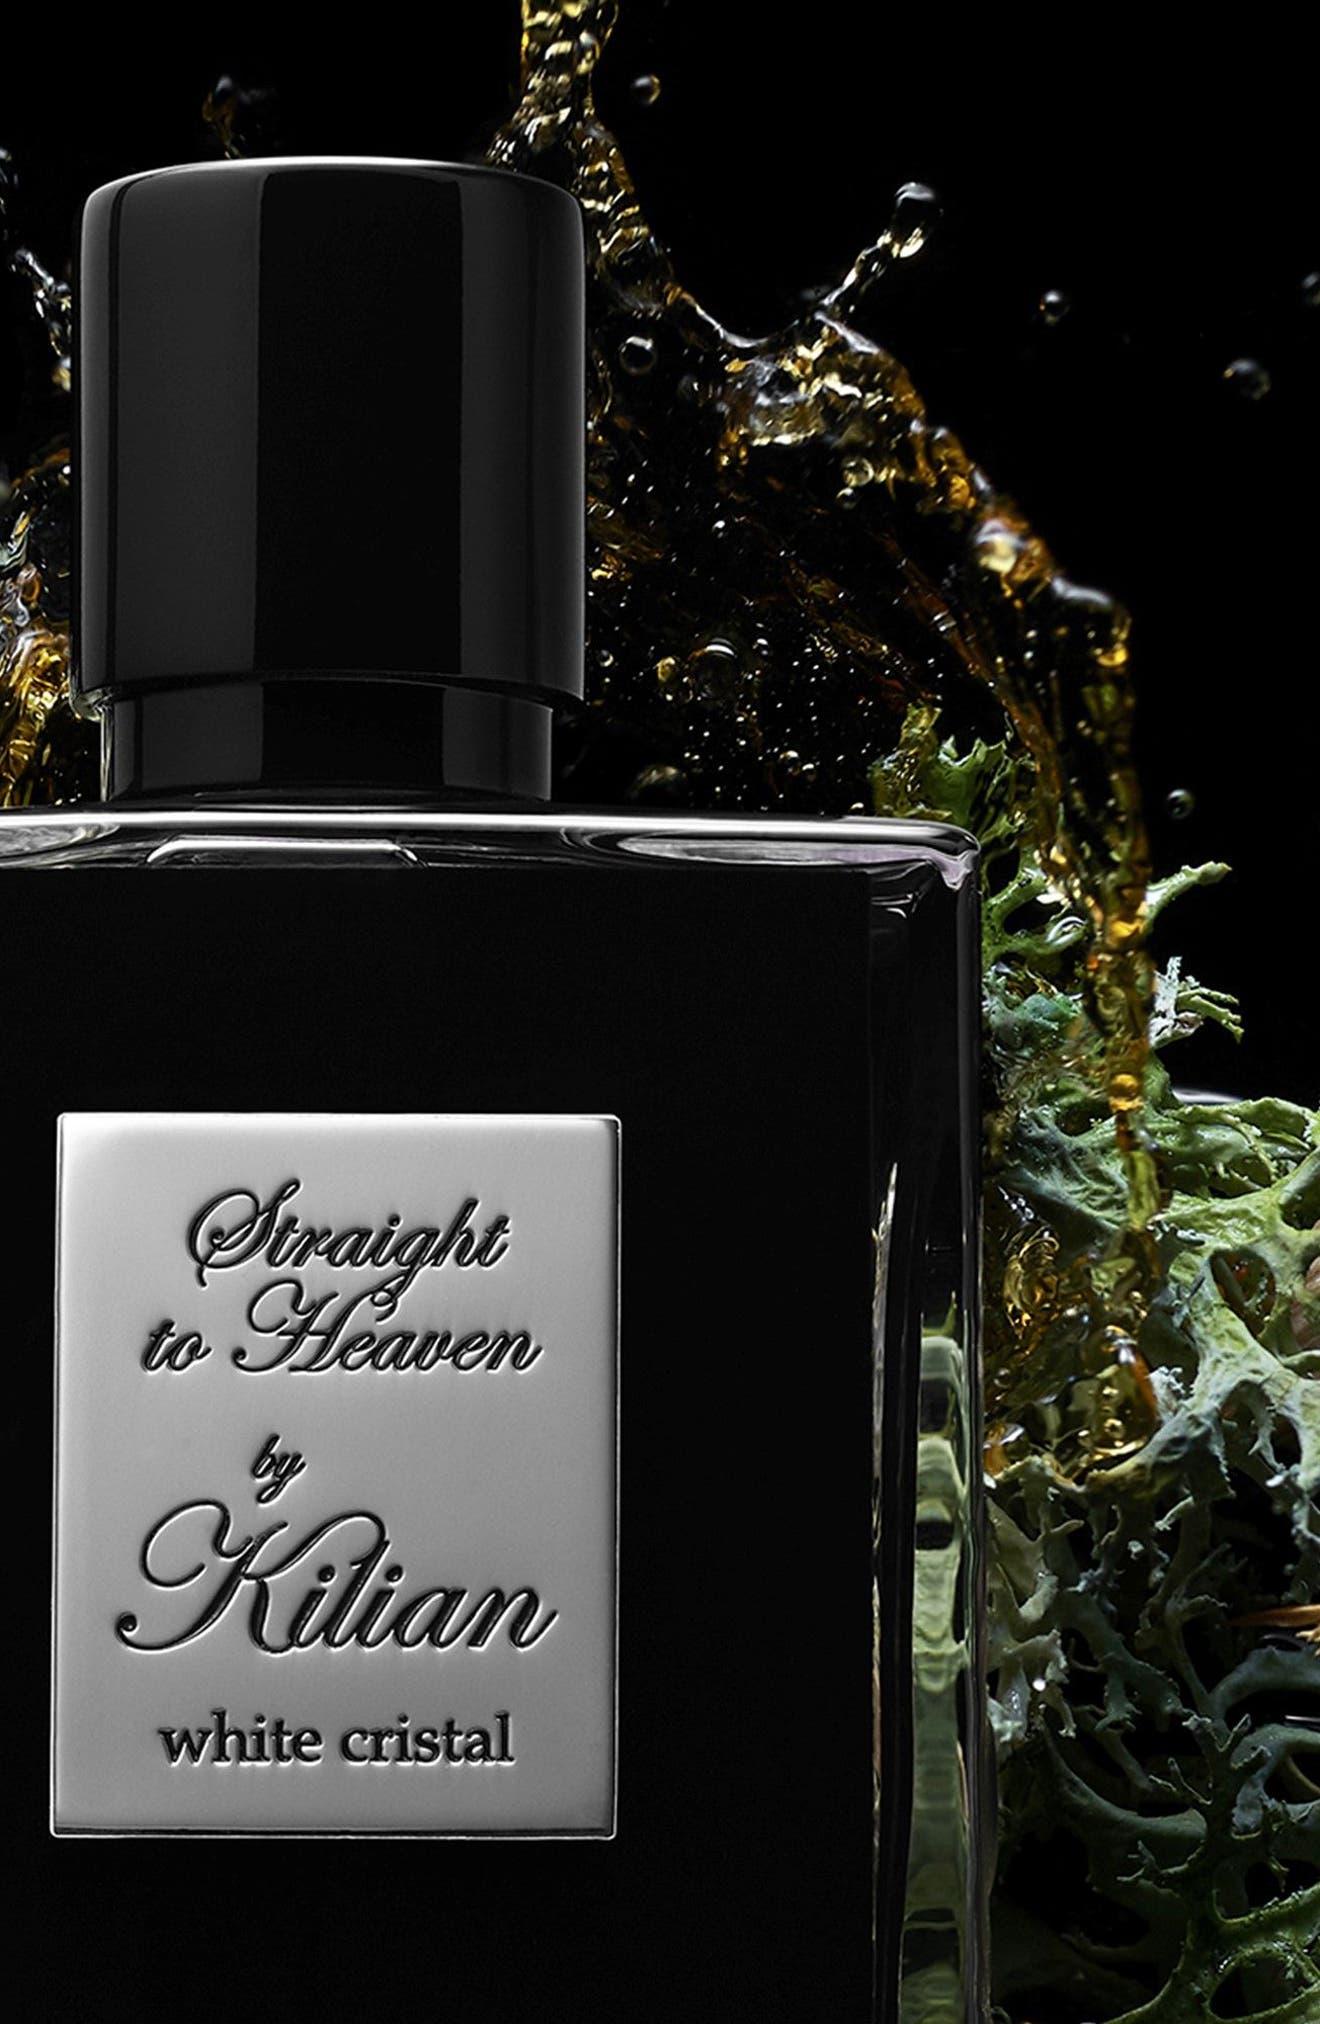 'L'Oeuvre Noire - Straight to Heaven, white cristal' Travel Set,                             Alternate thumbnail 2, color,                             No Color